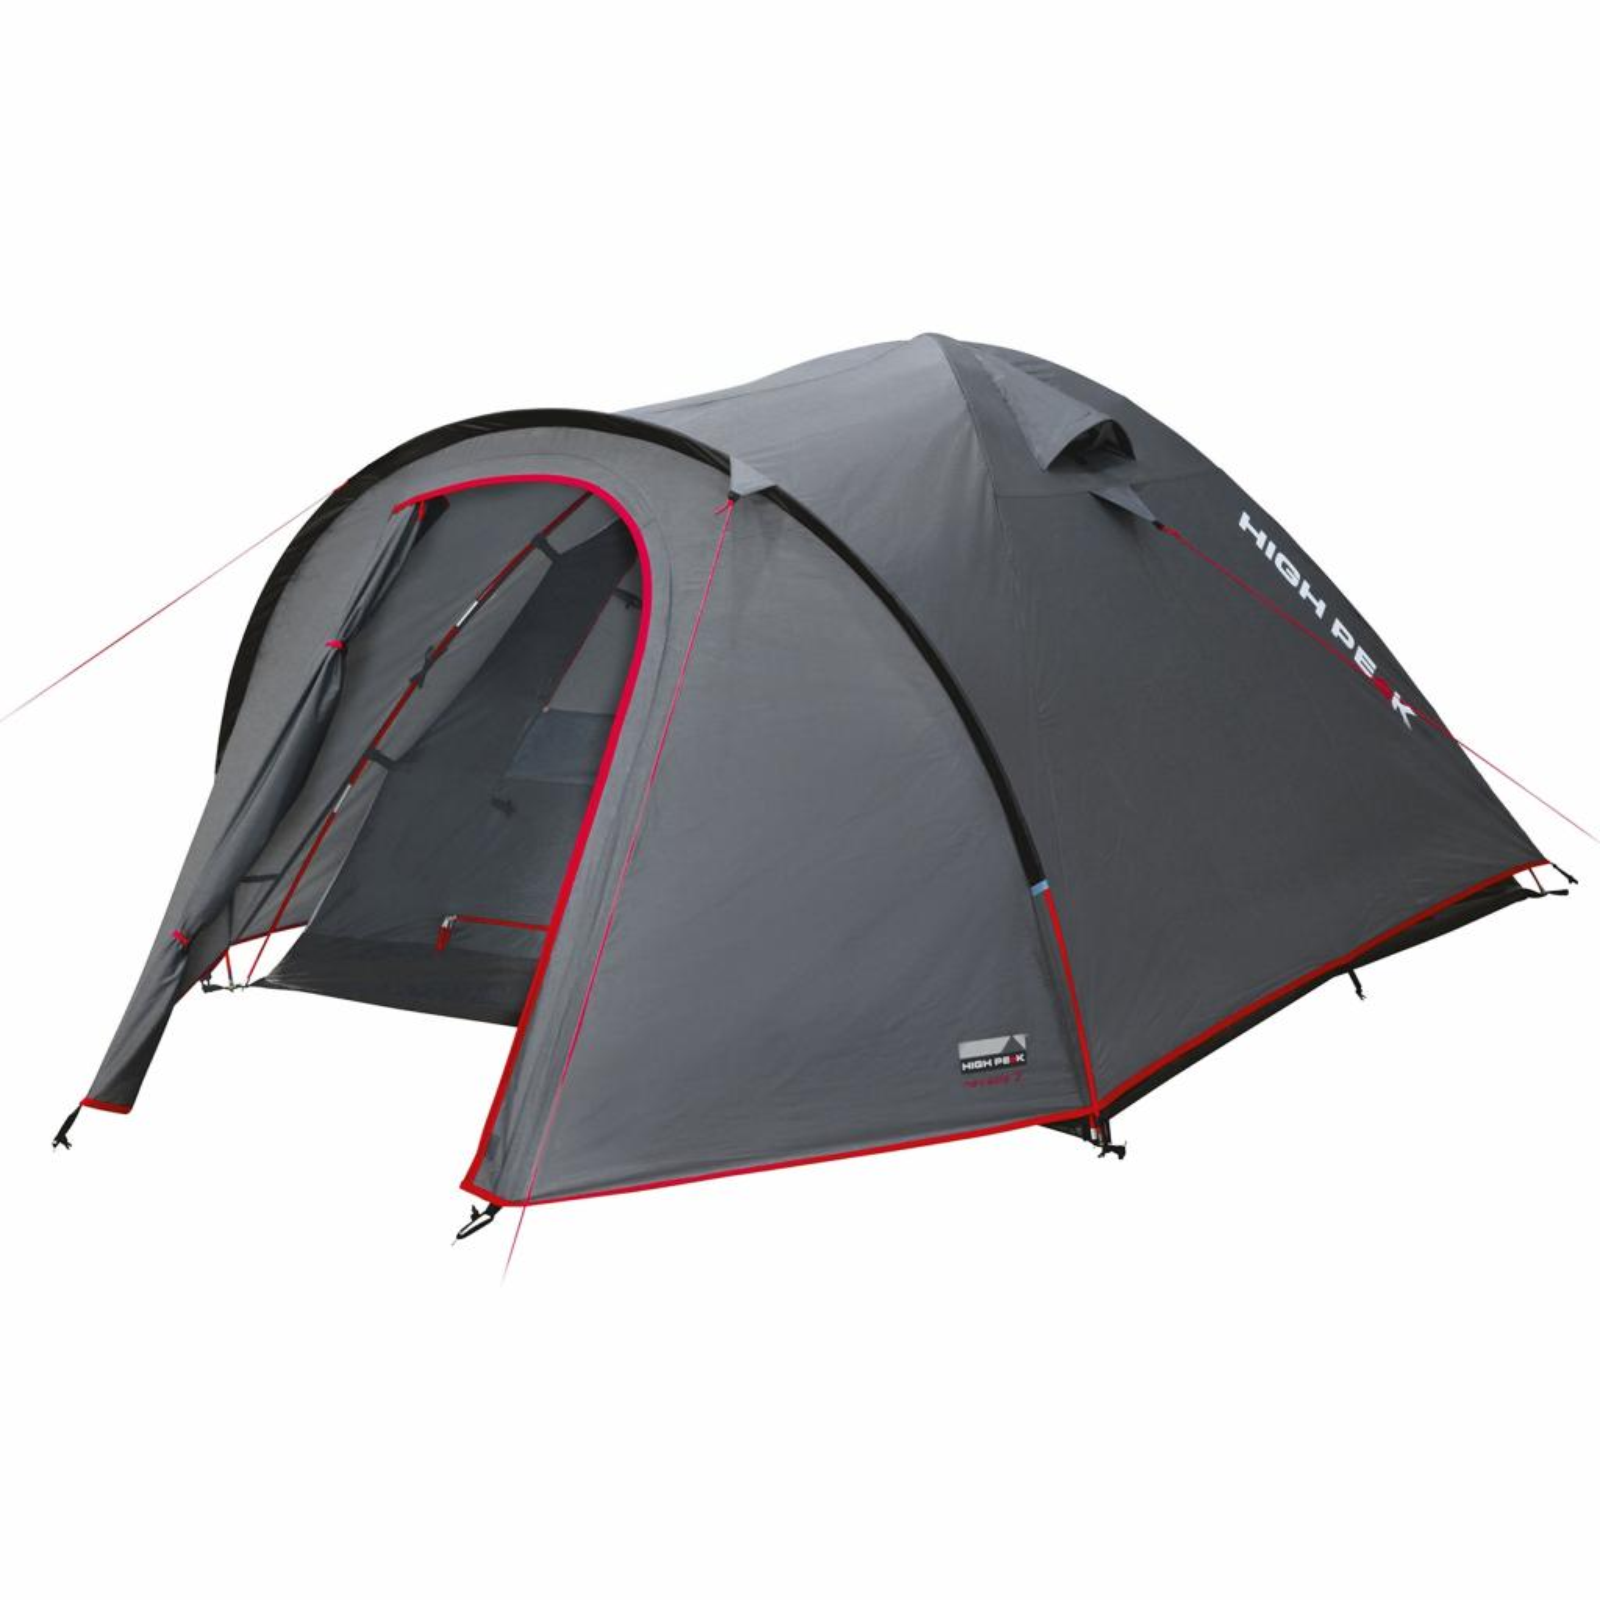 Палатка High Peak Nevada 4 Dark Grey/Red (926274)